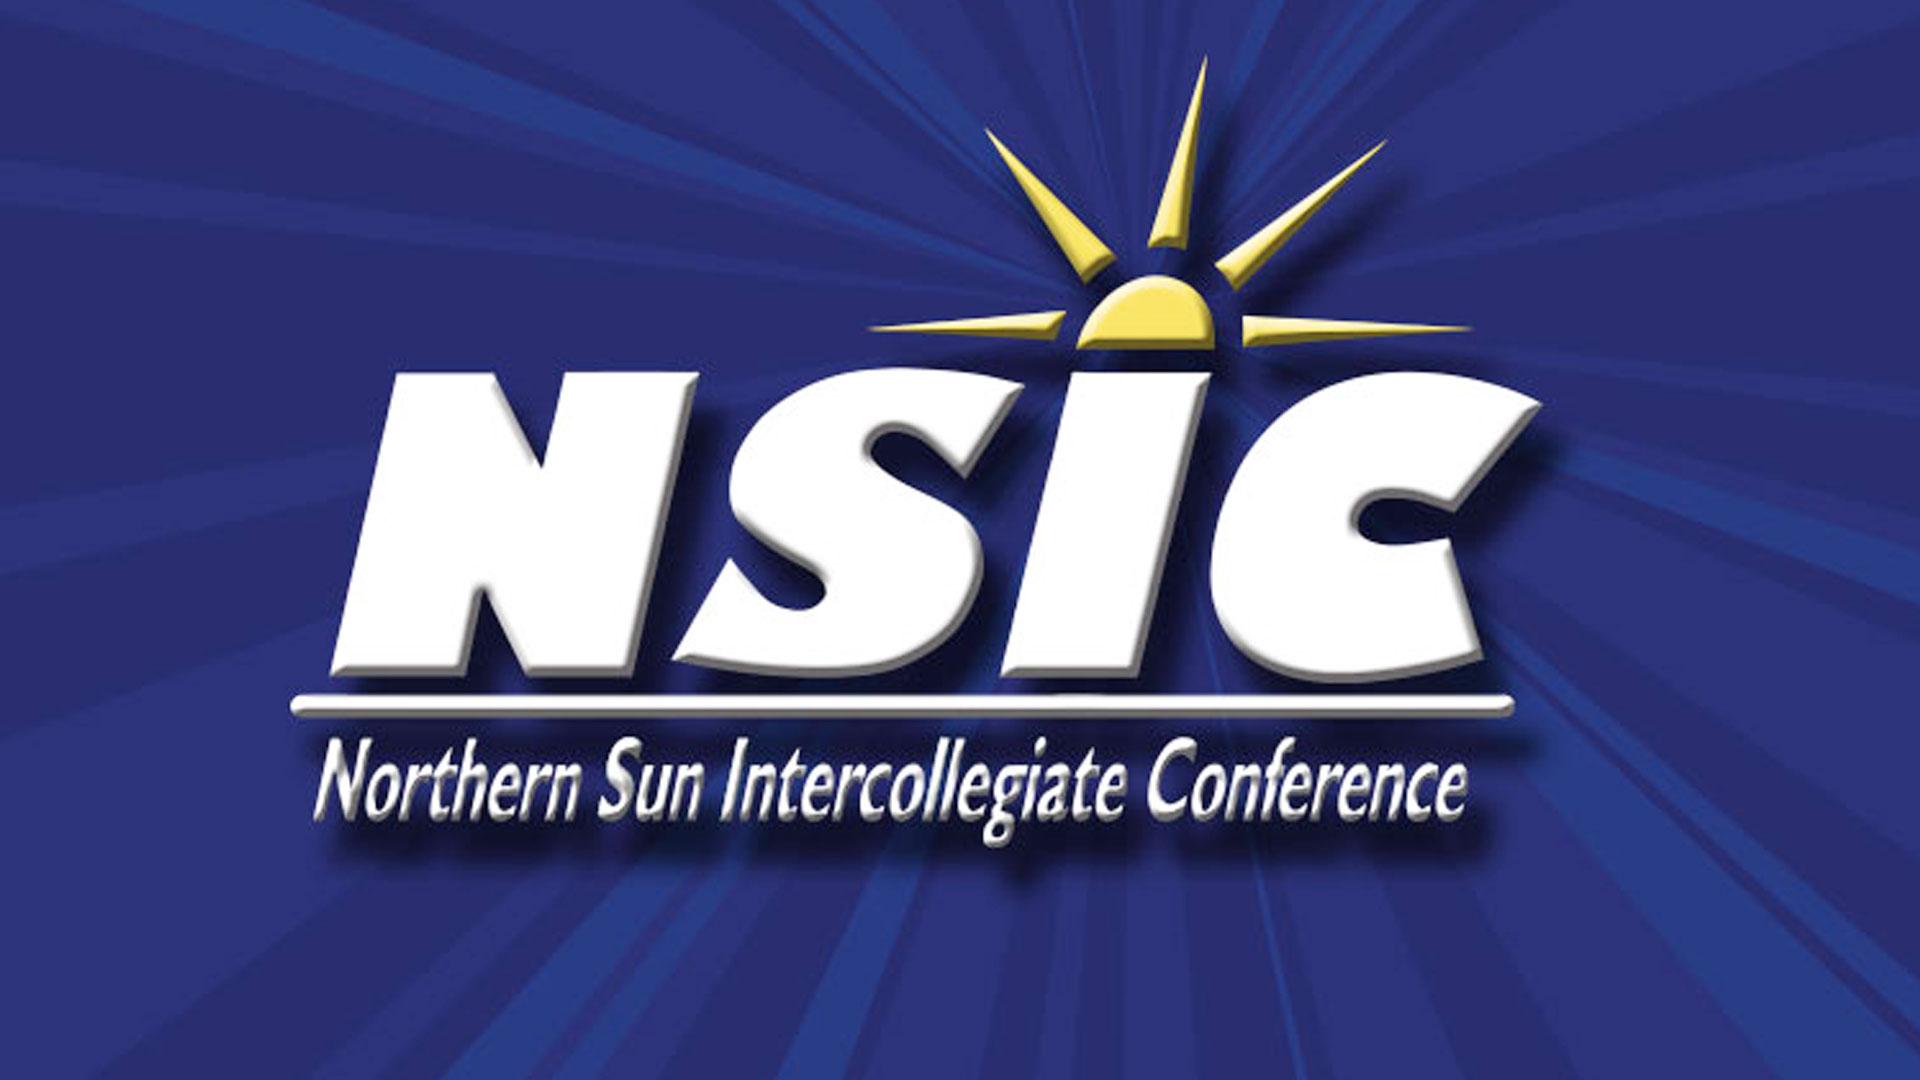 KELO NSIC Northern Sun Intercollegiate Conference logo